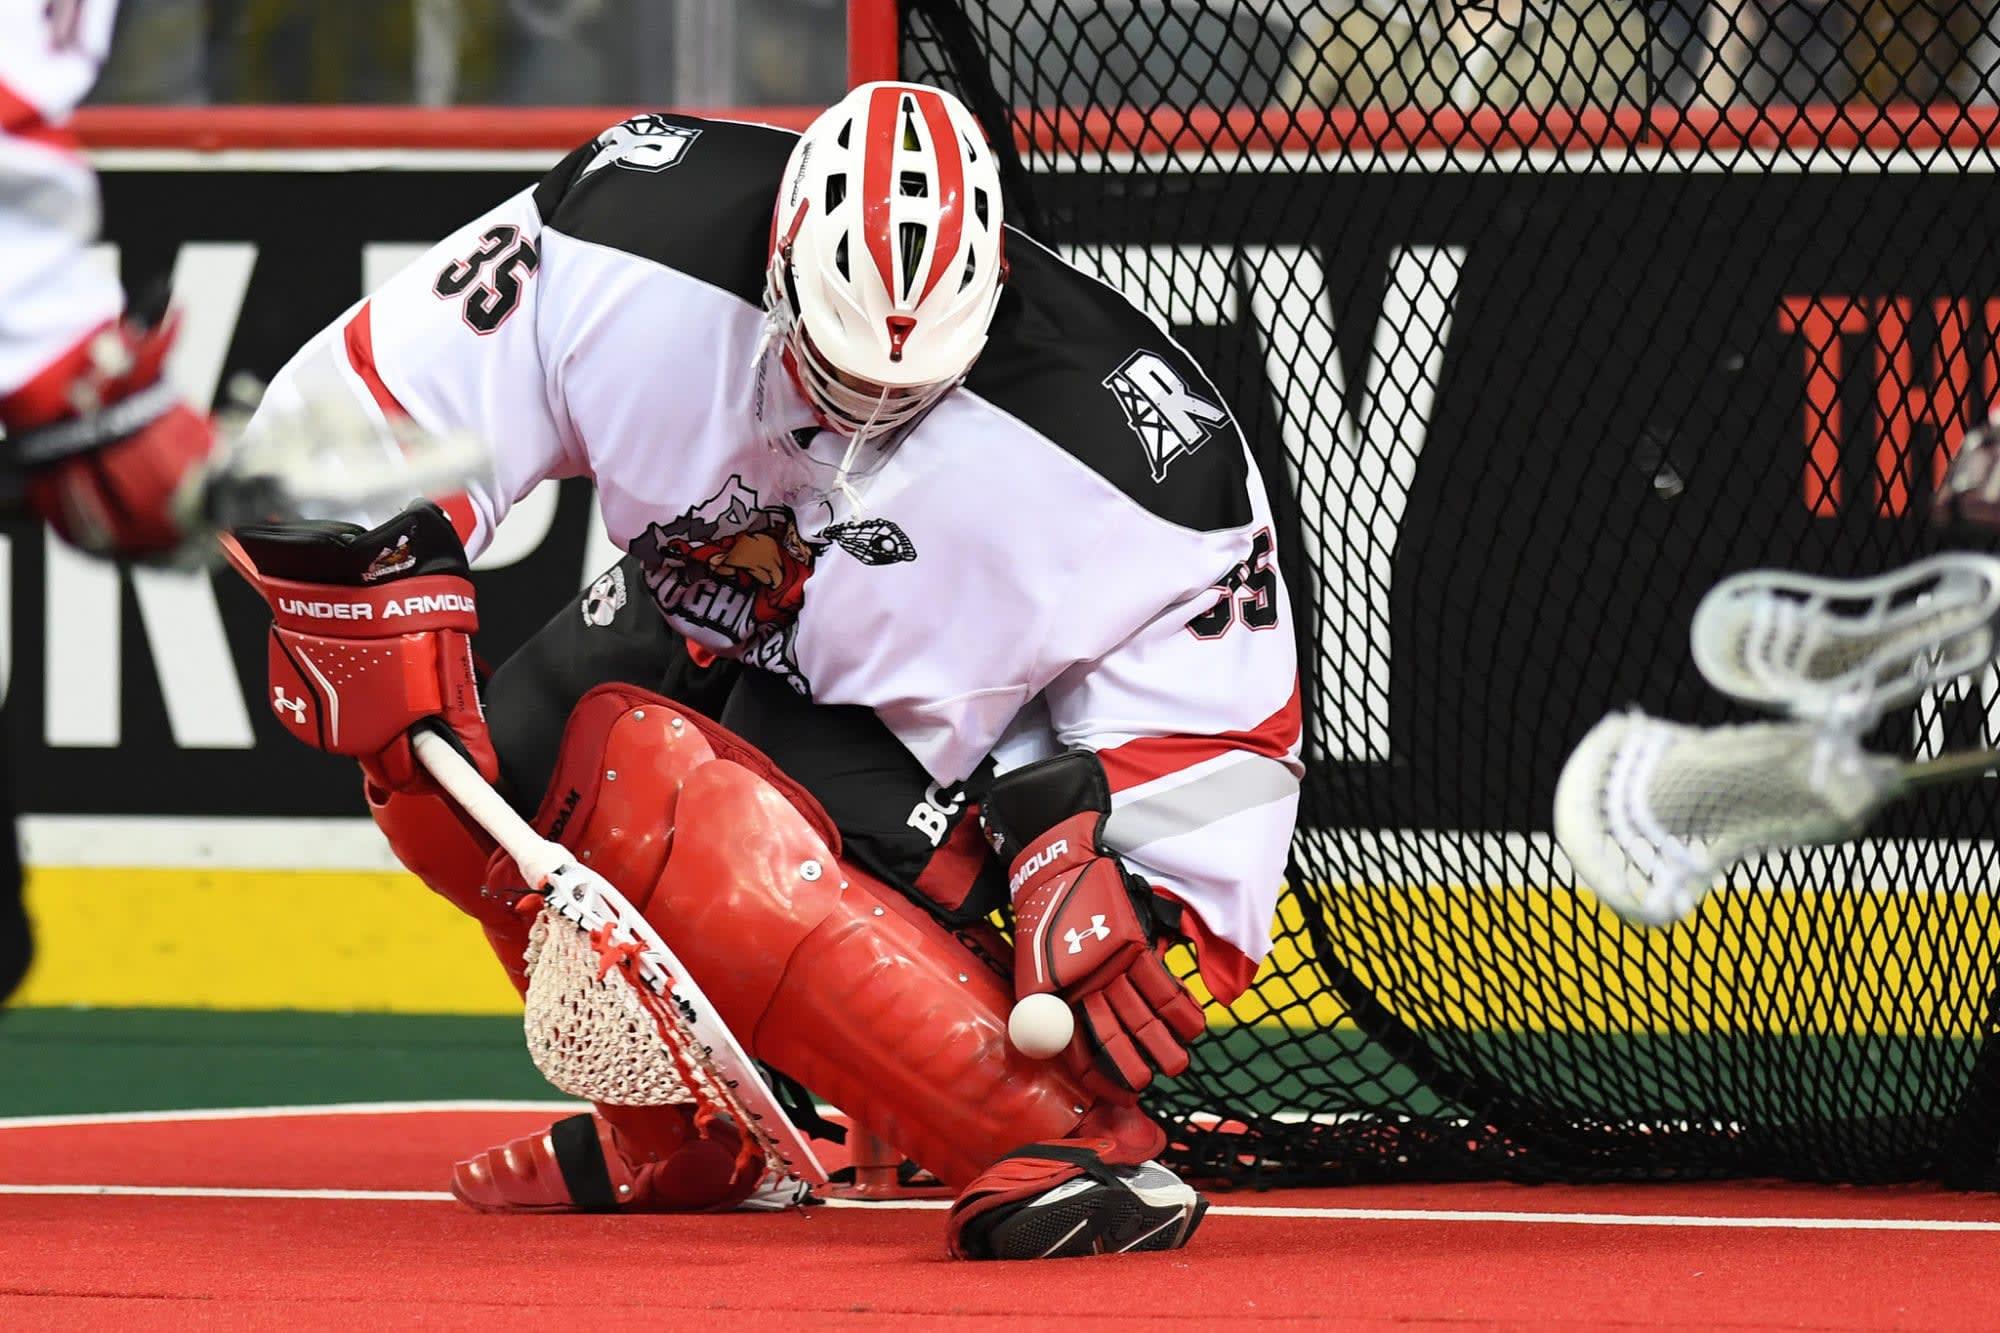 Christian Del Bianco Calgary Roughnecks NLL 2018